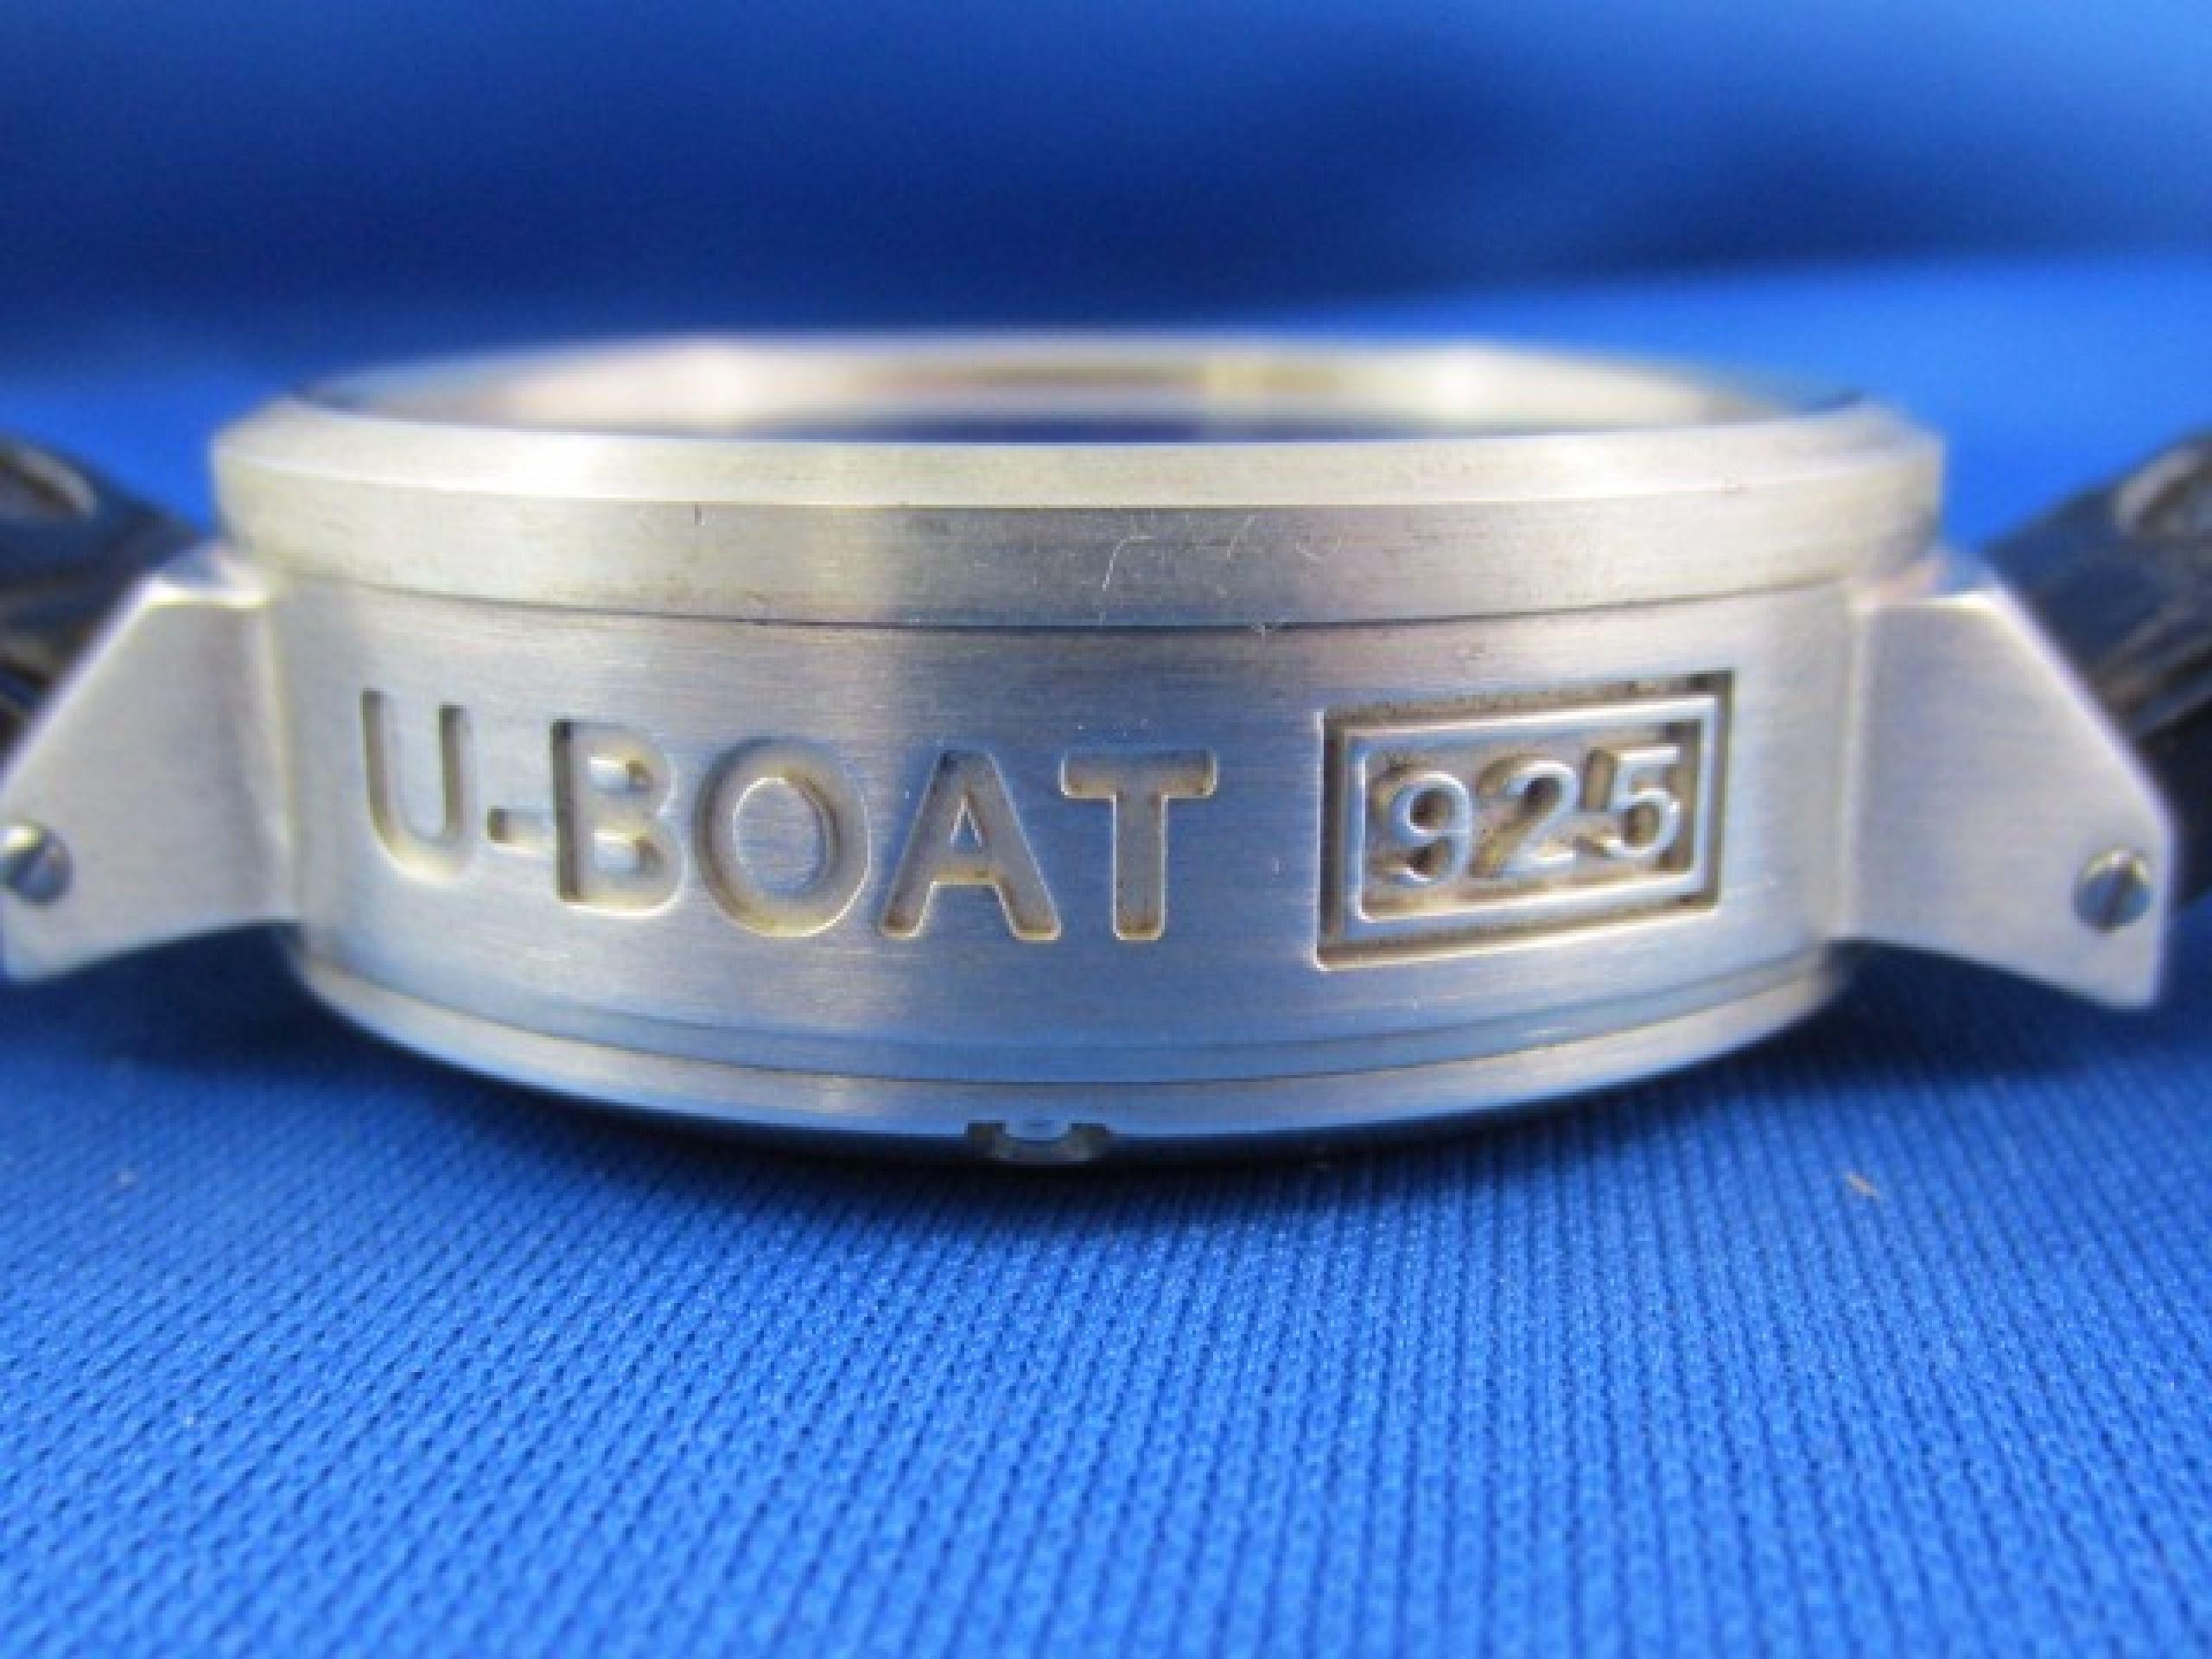 U-BOAT FLIGHTDECK CA 925 1884